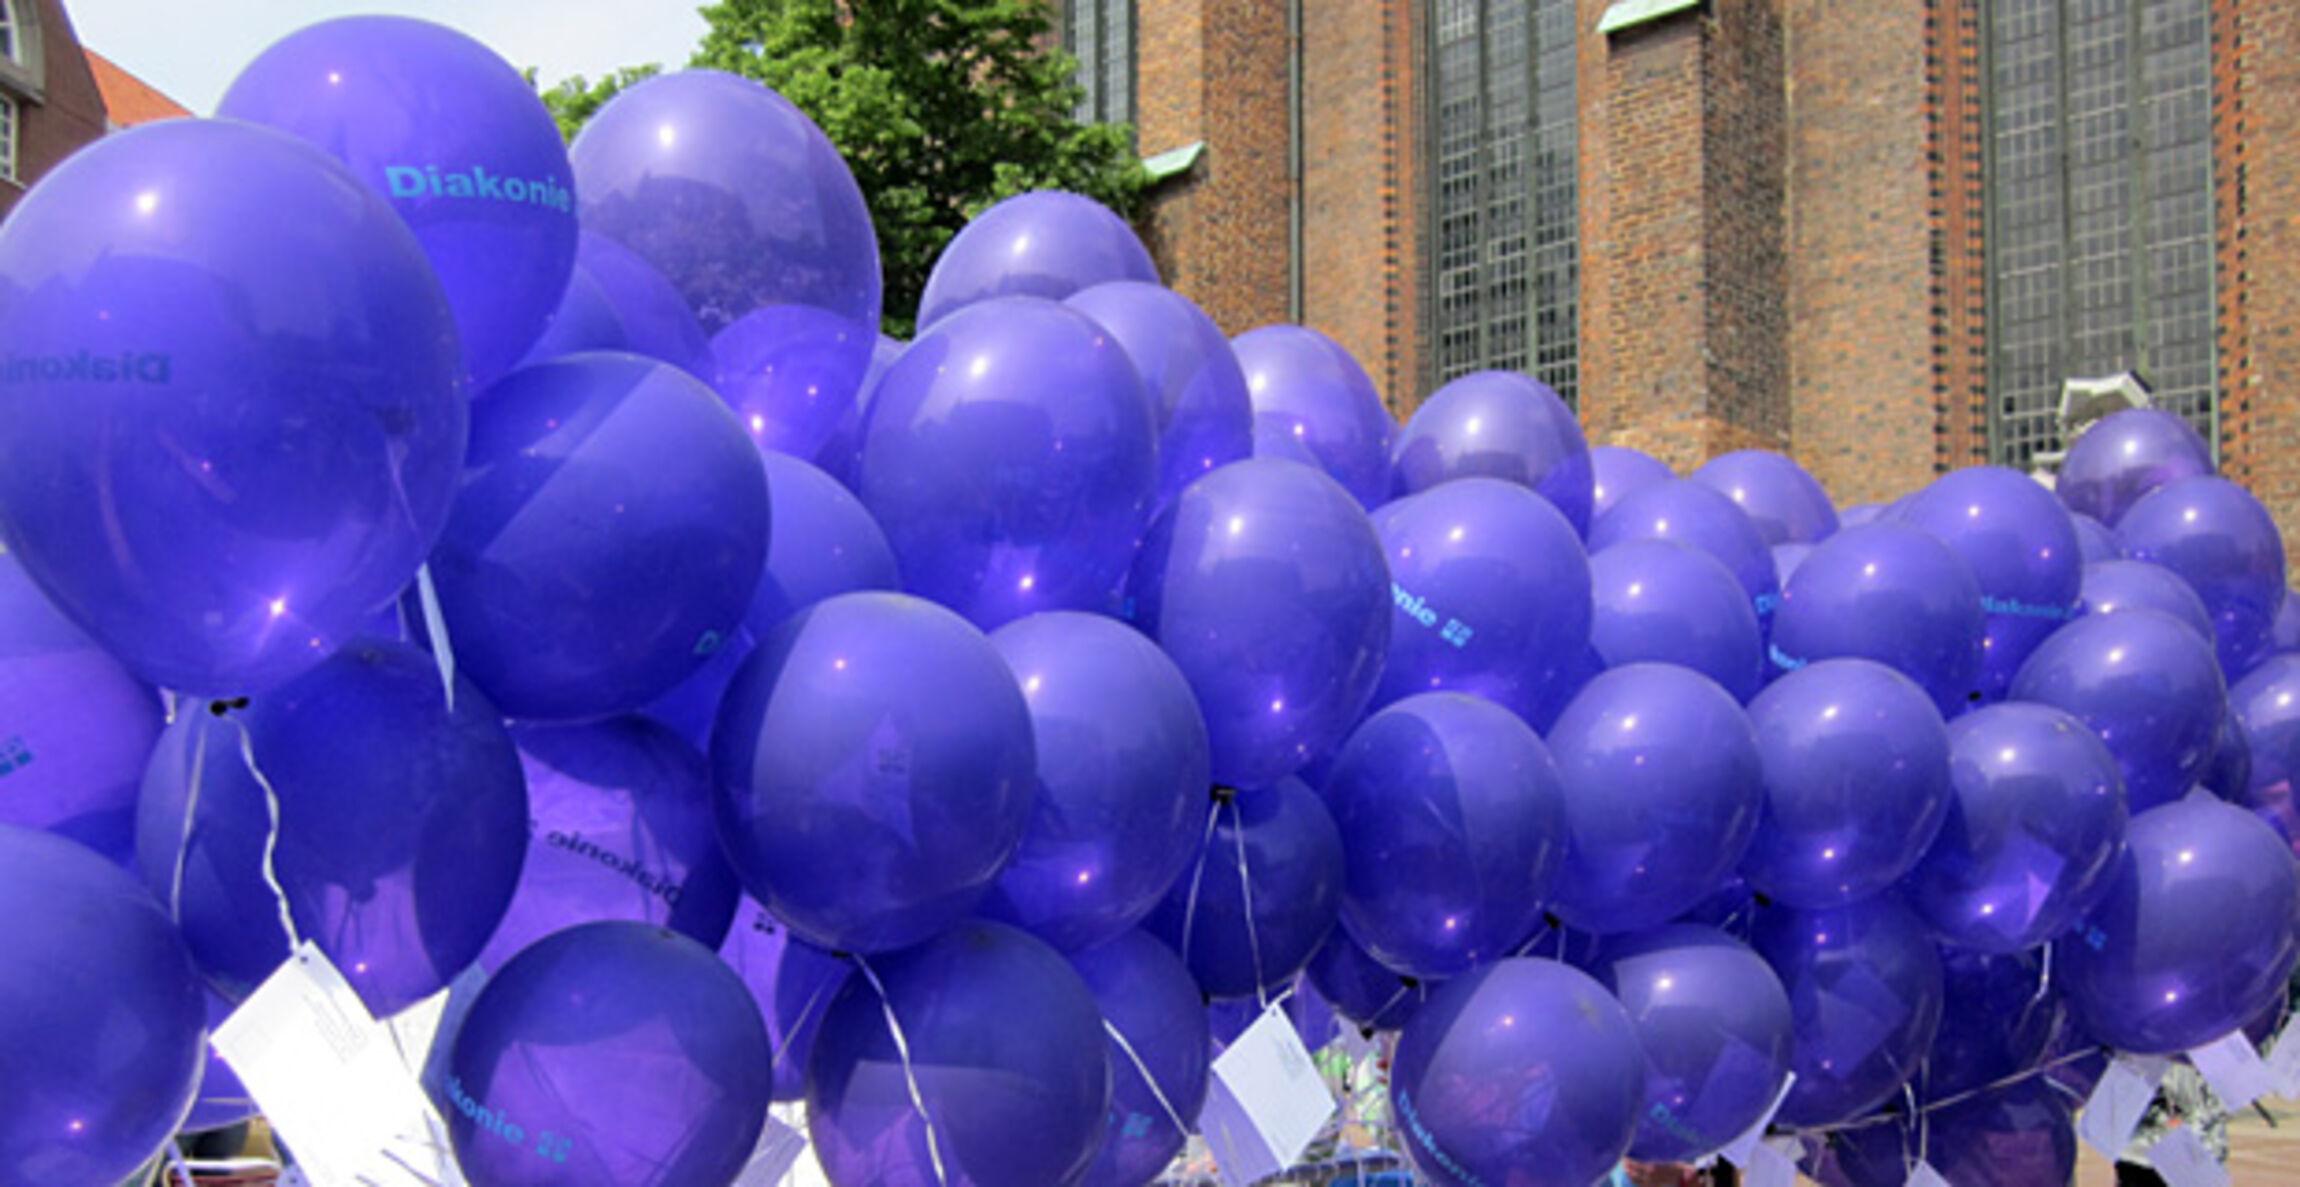 Diakonieluftballons